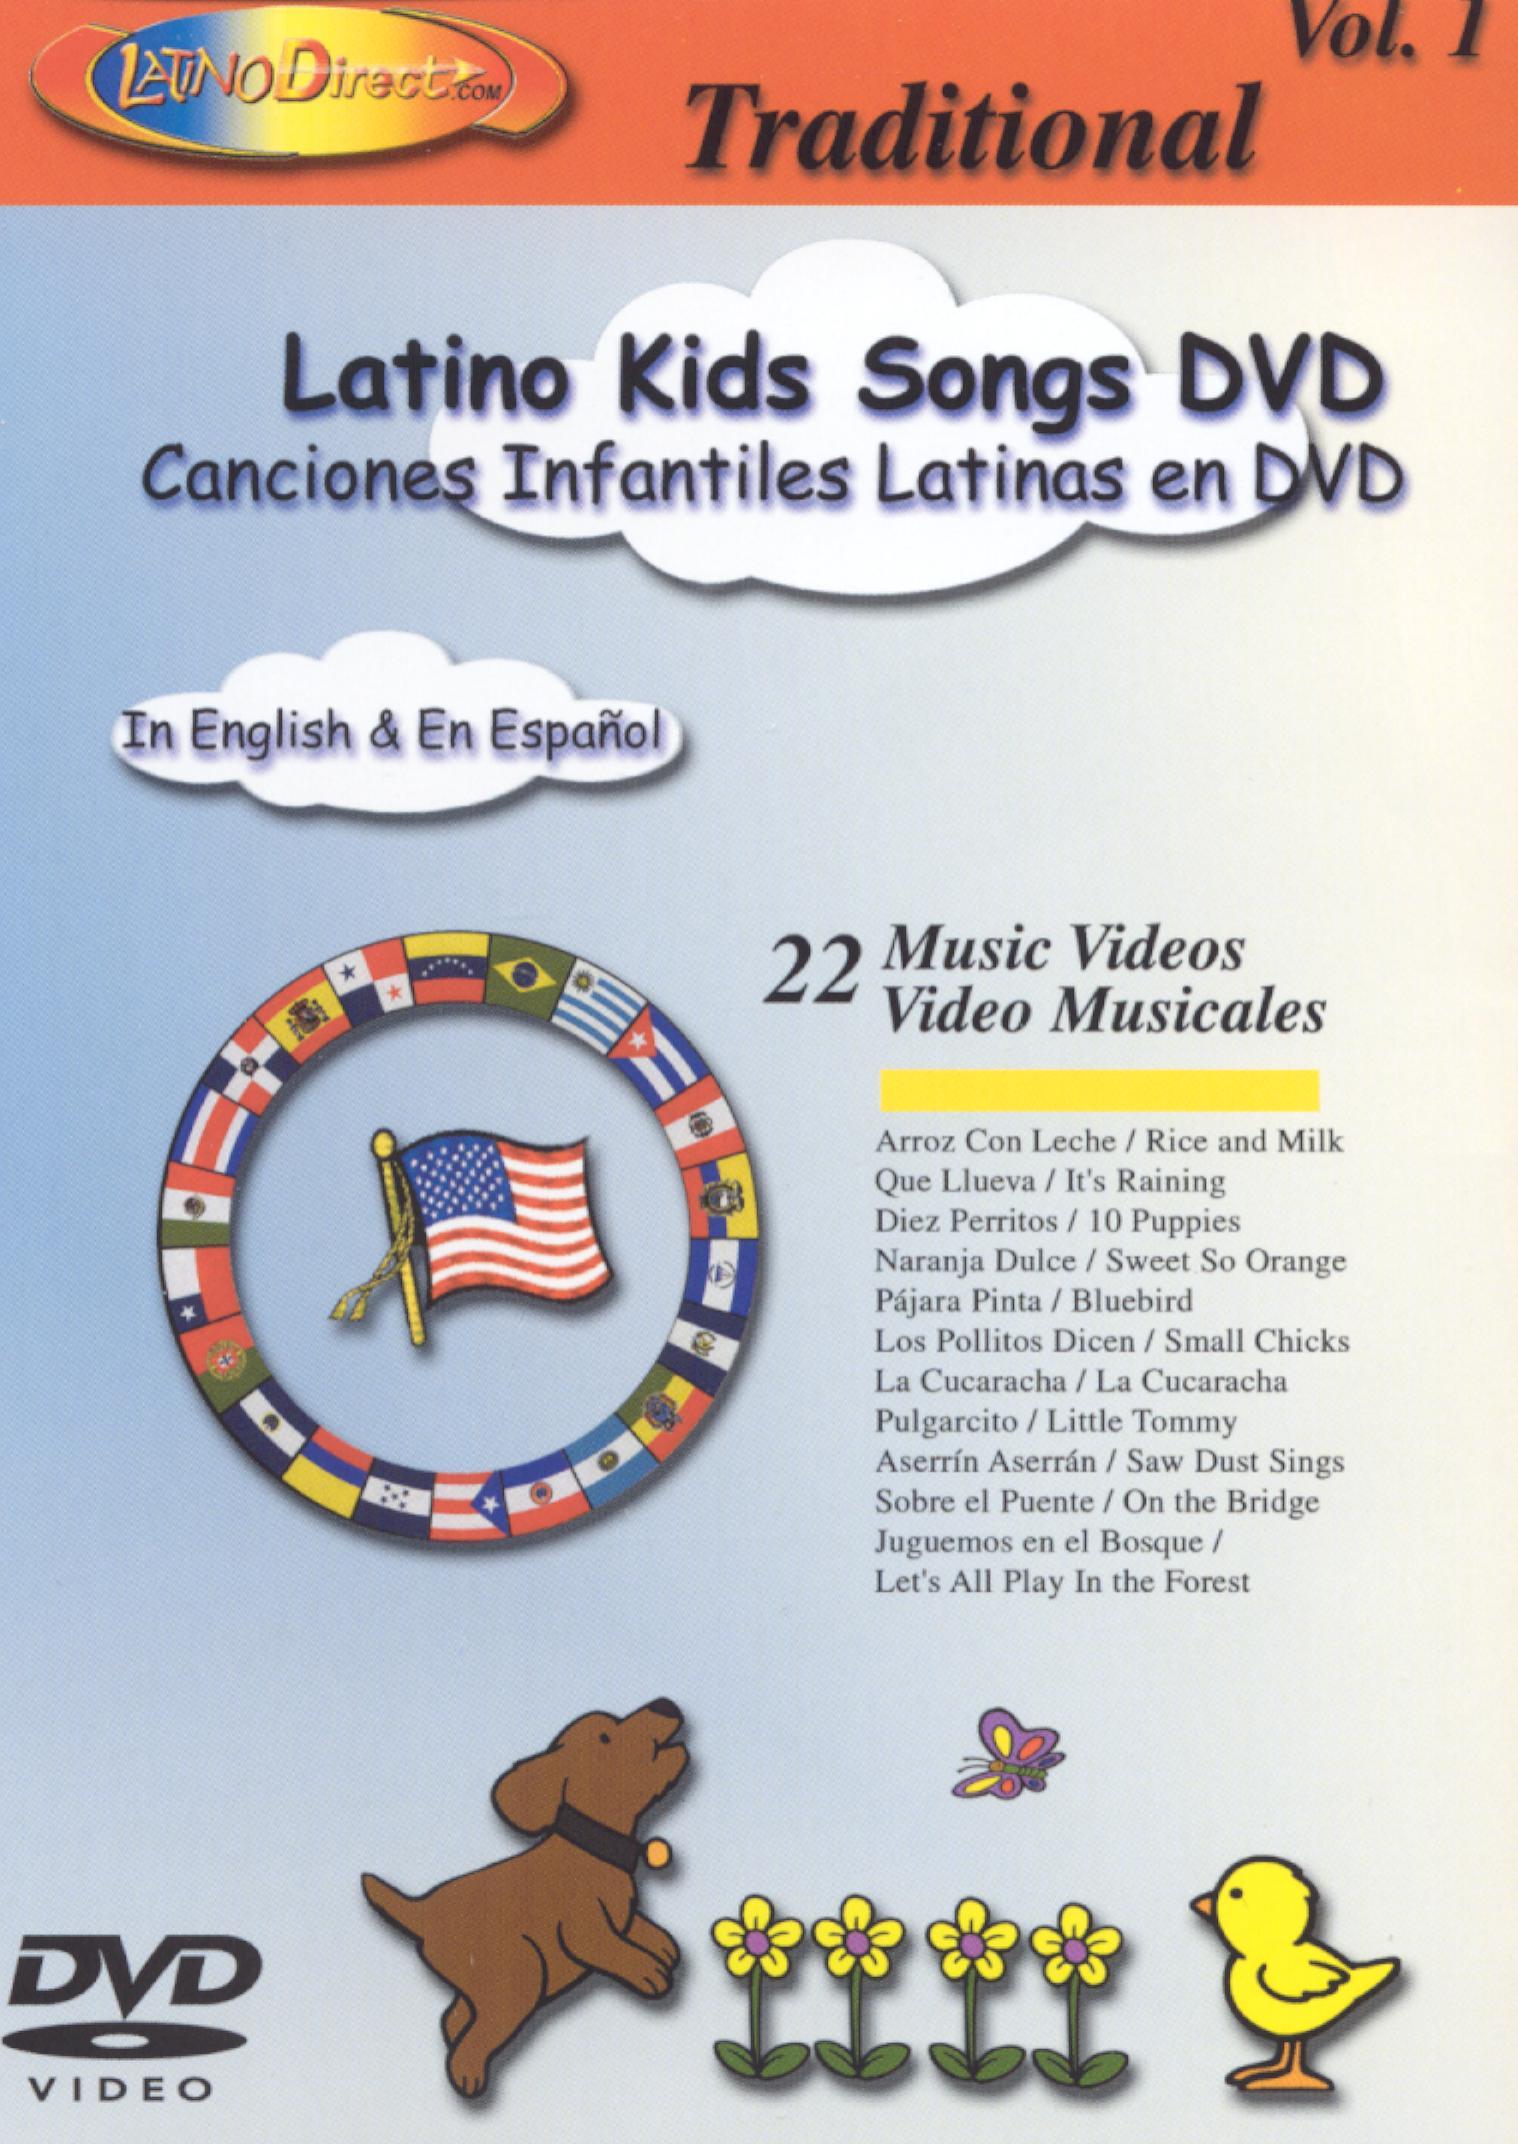 Traditional Latino Kids Songs, Vol. 1